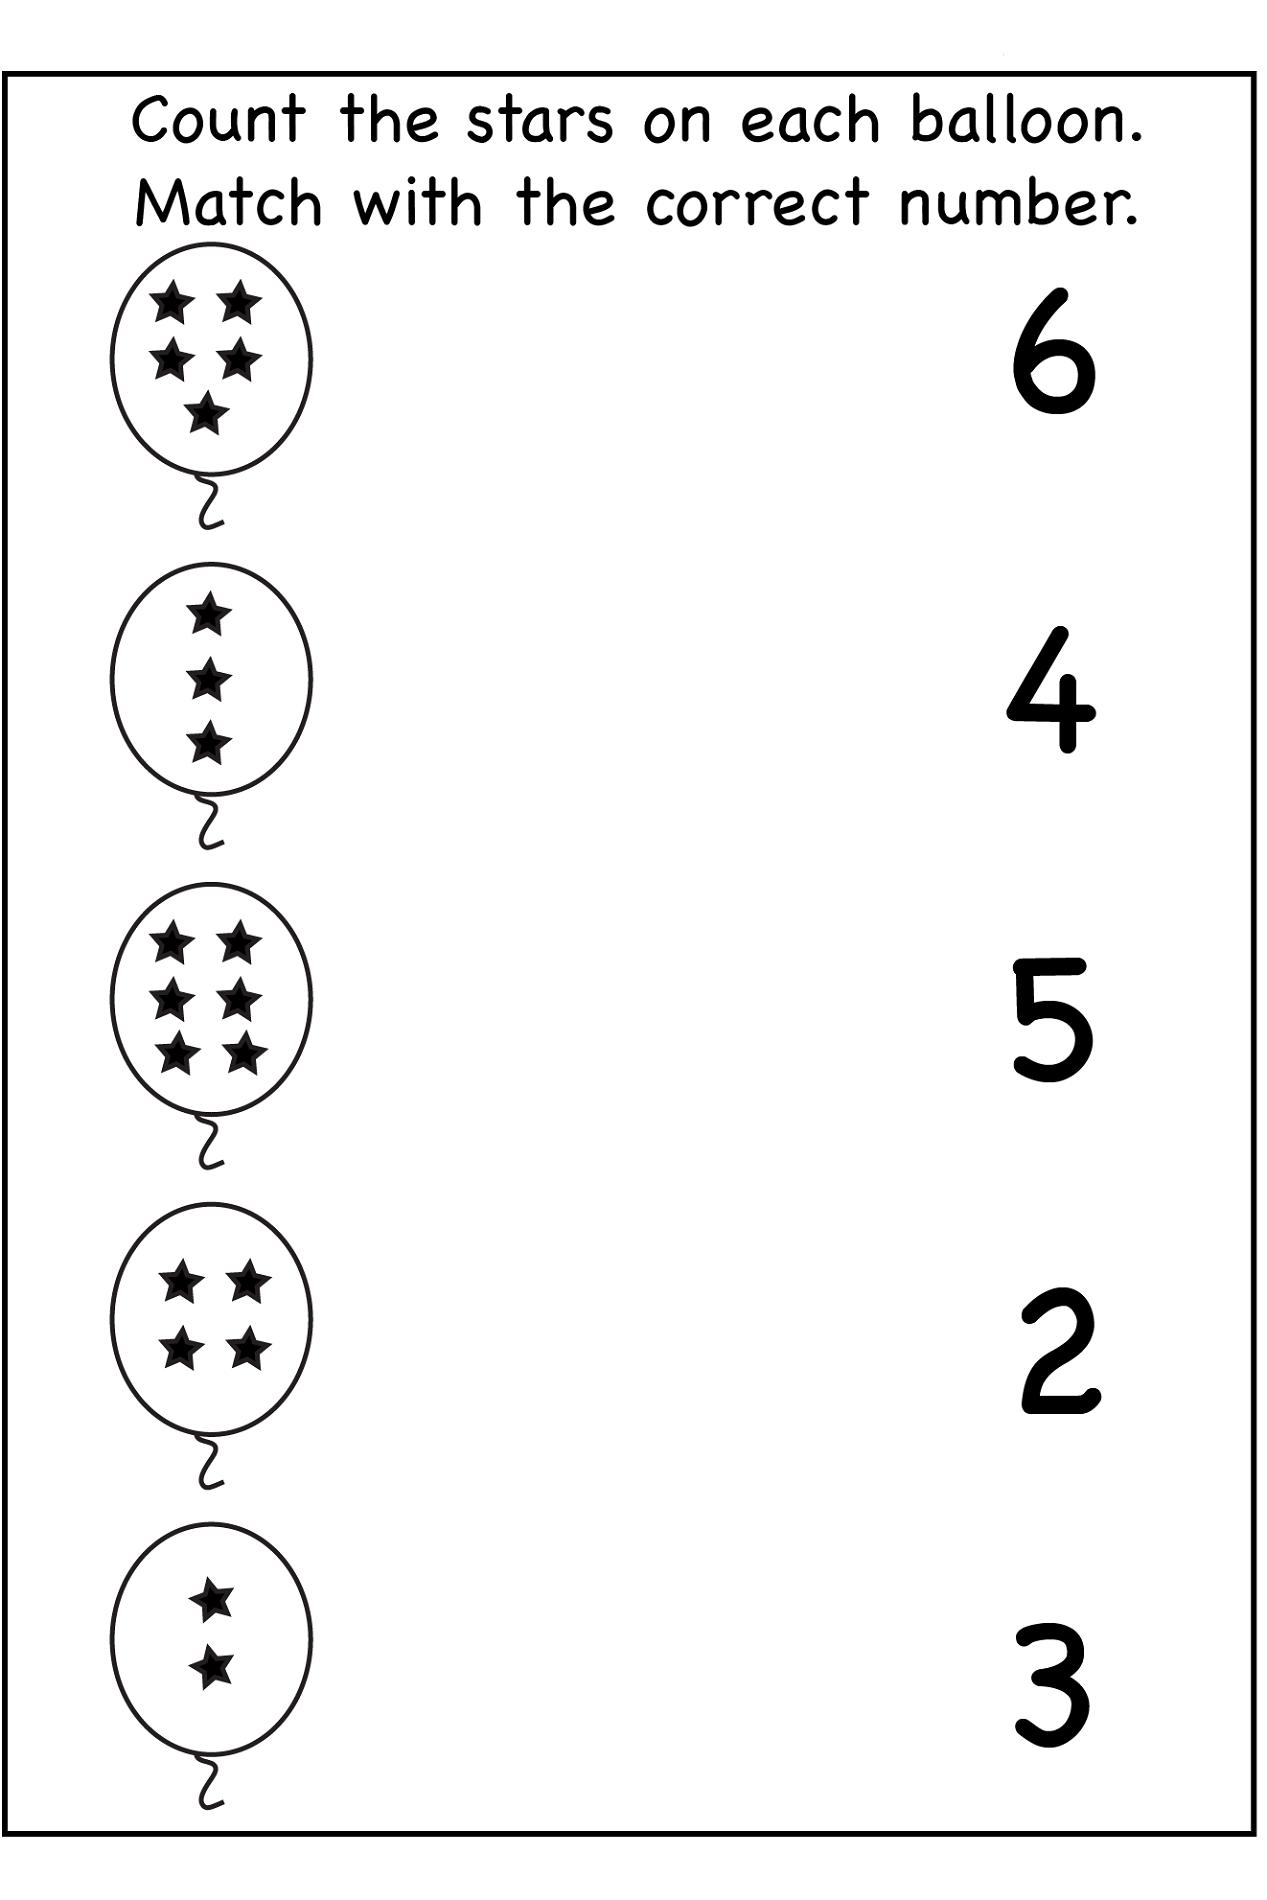 pre-k worksheets - Yahoo Image Search Results   Preschool math worksheets [ 1900 x 1267 Pixel ]